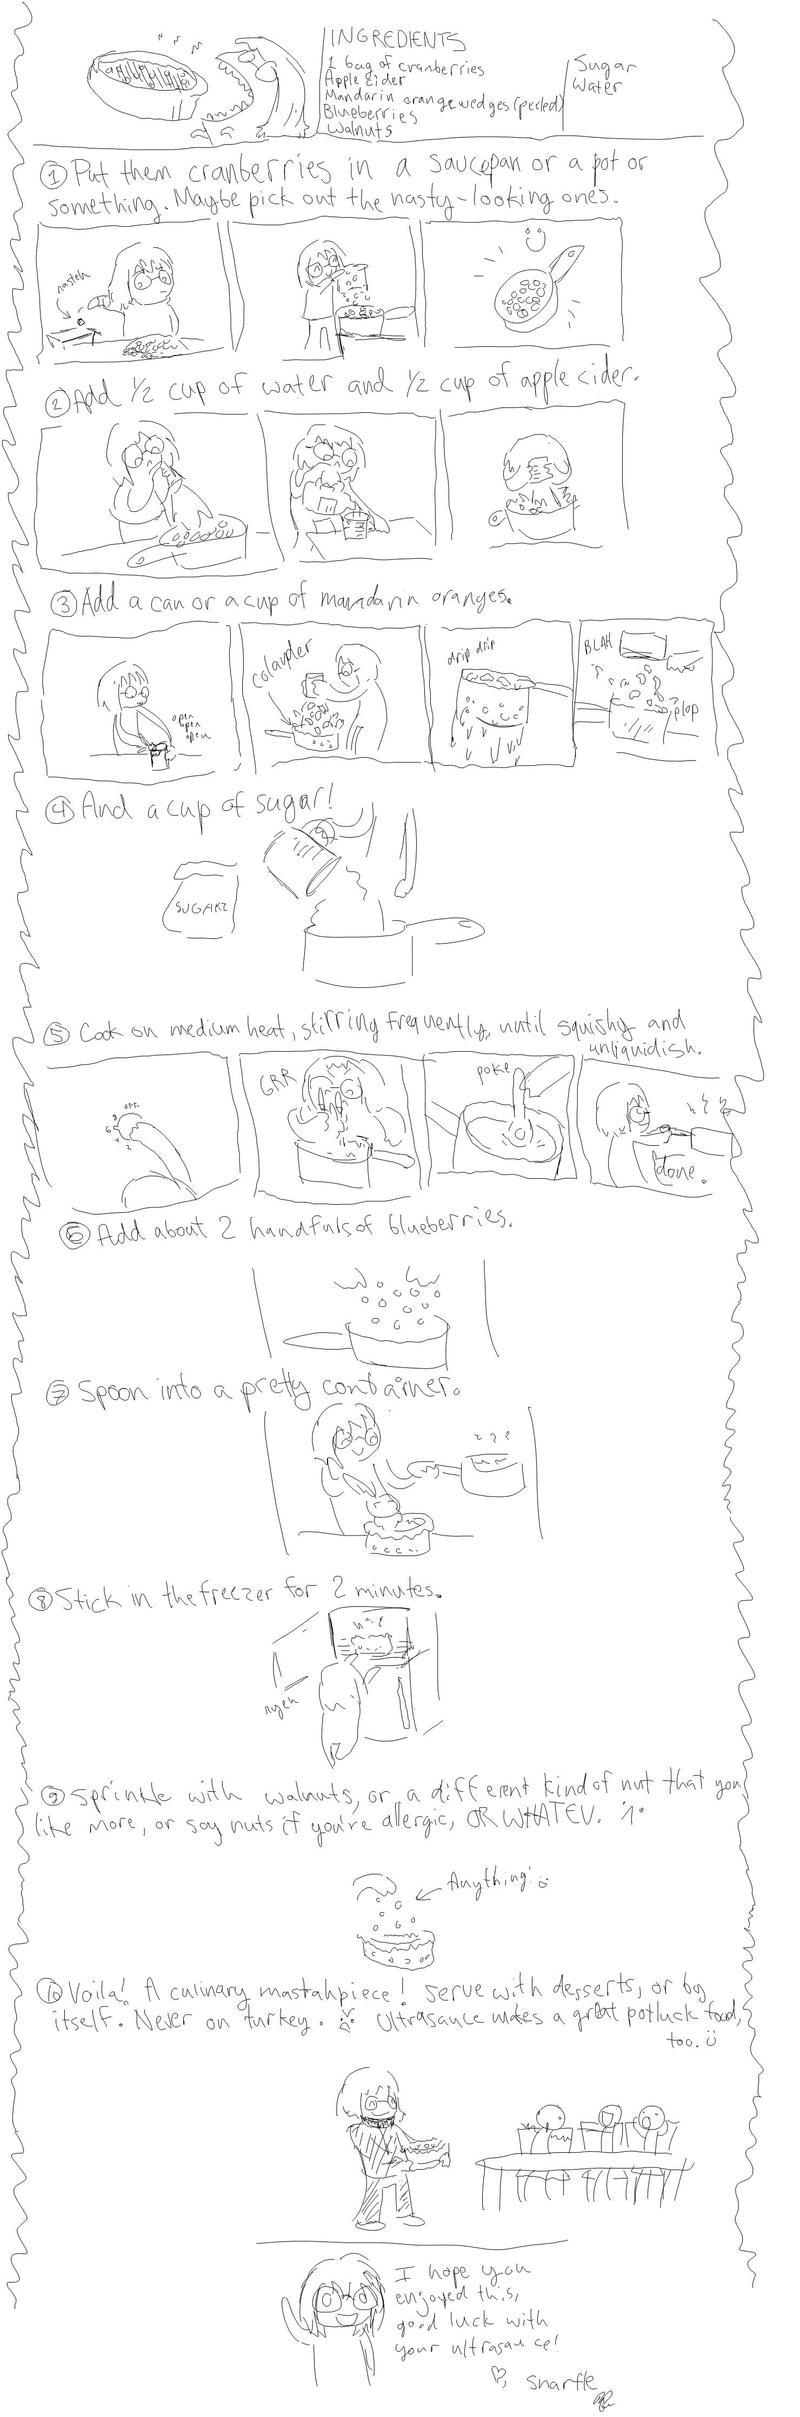 Ultrasauce recipe by snarfles